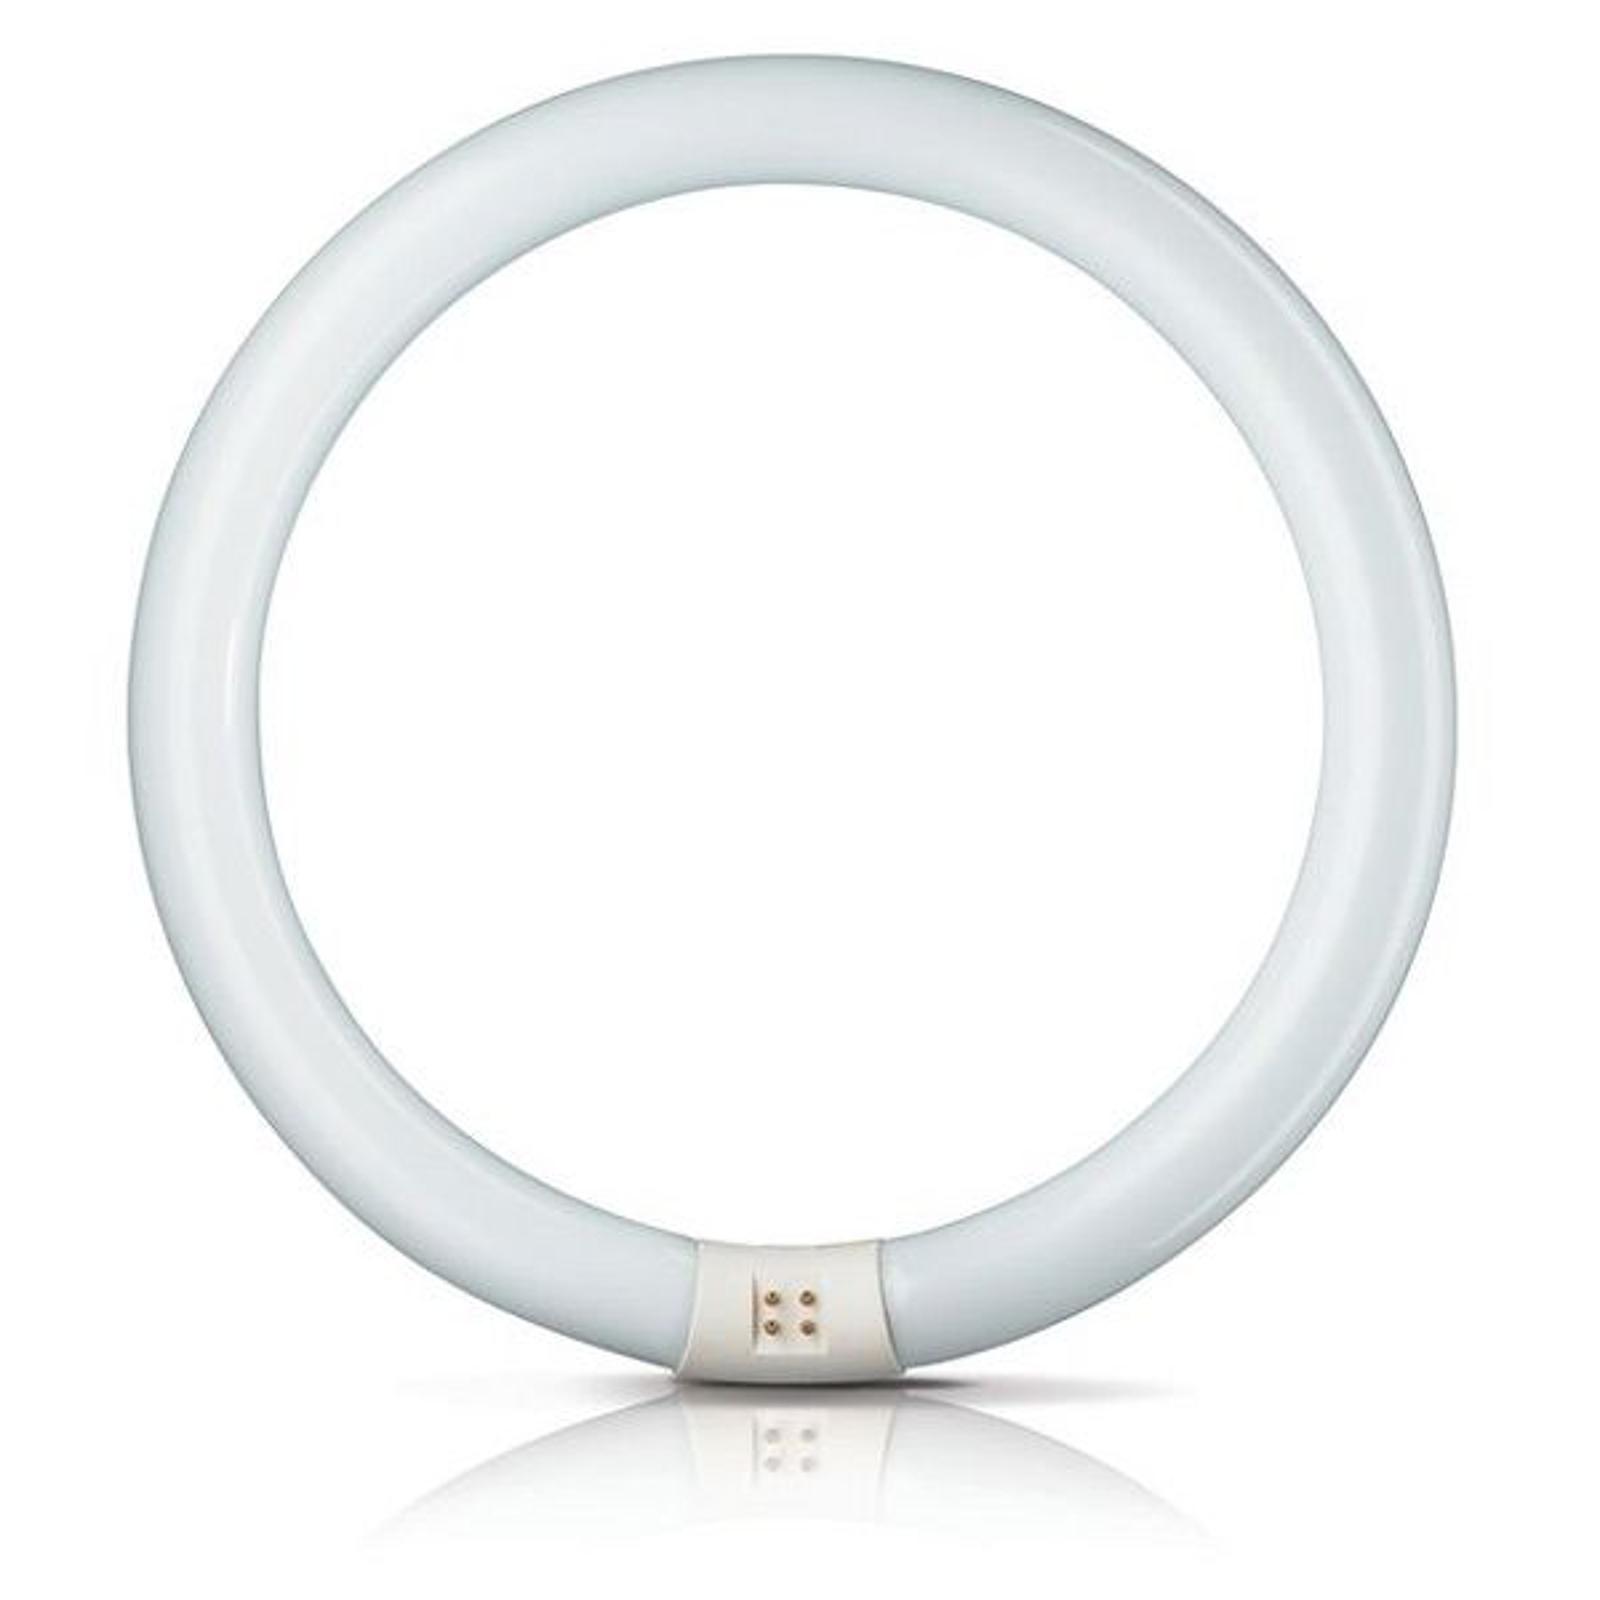 G10q 40W 840 Leuchtstoffring Master Circular TL-E